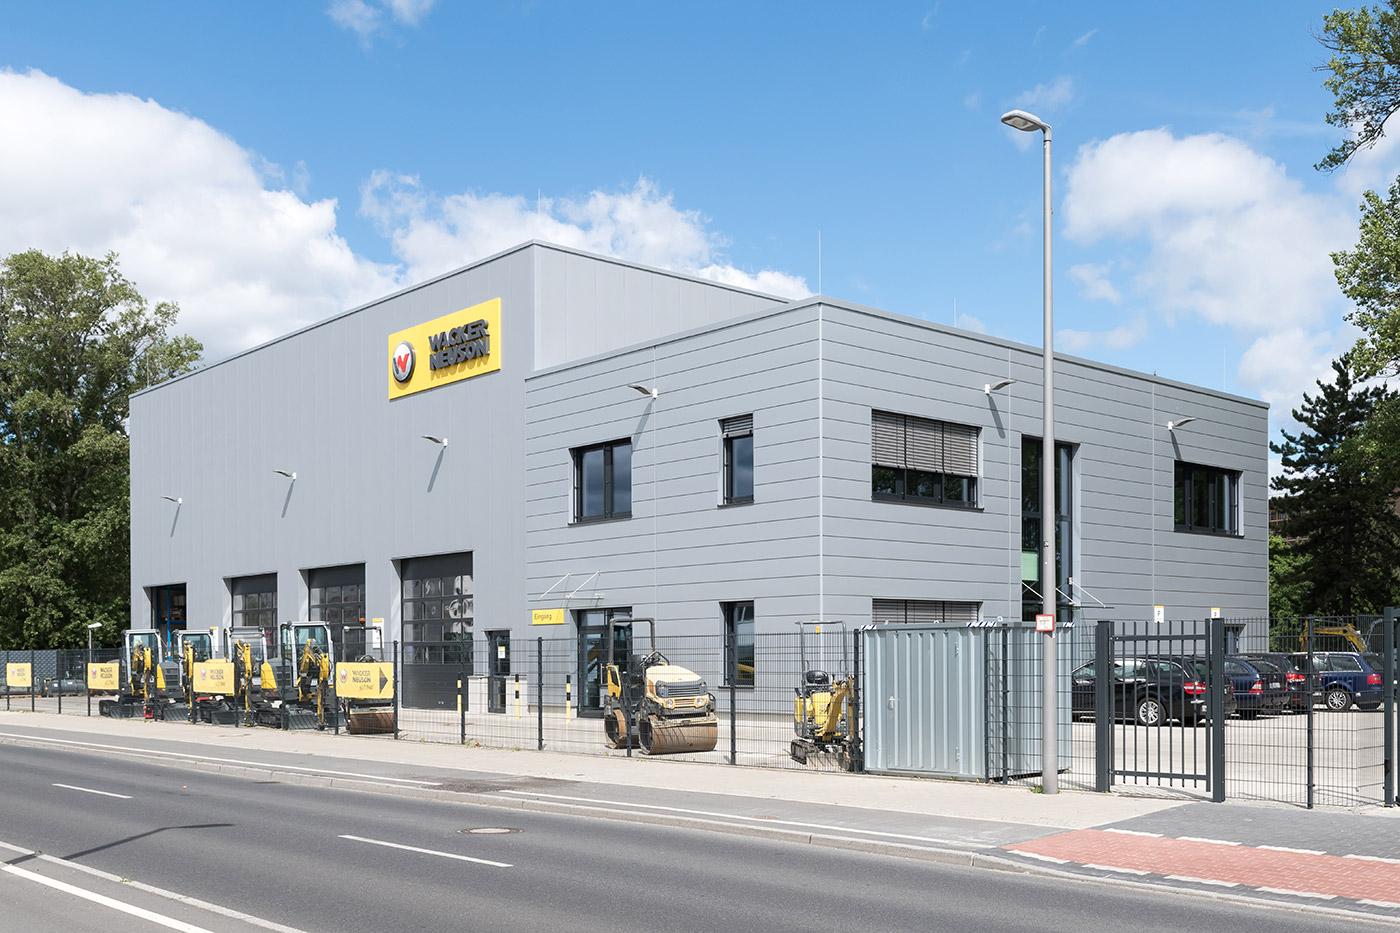 Wacker Neuson - Referenzen - Beck Trockenbau GmbH